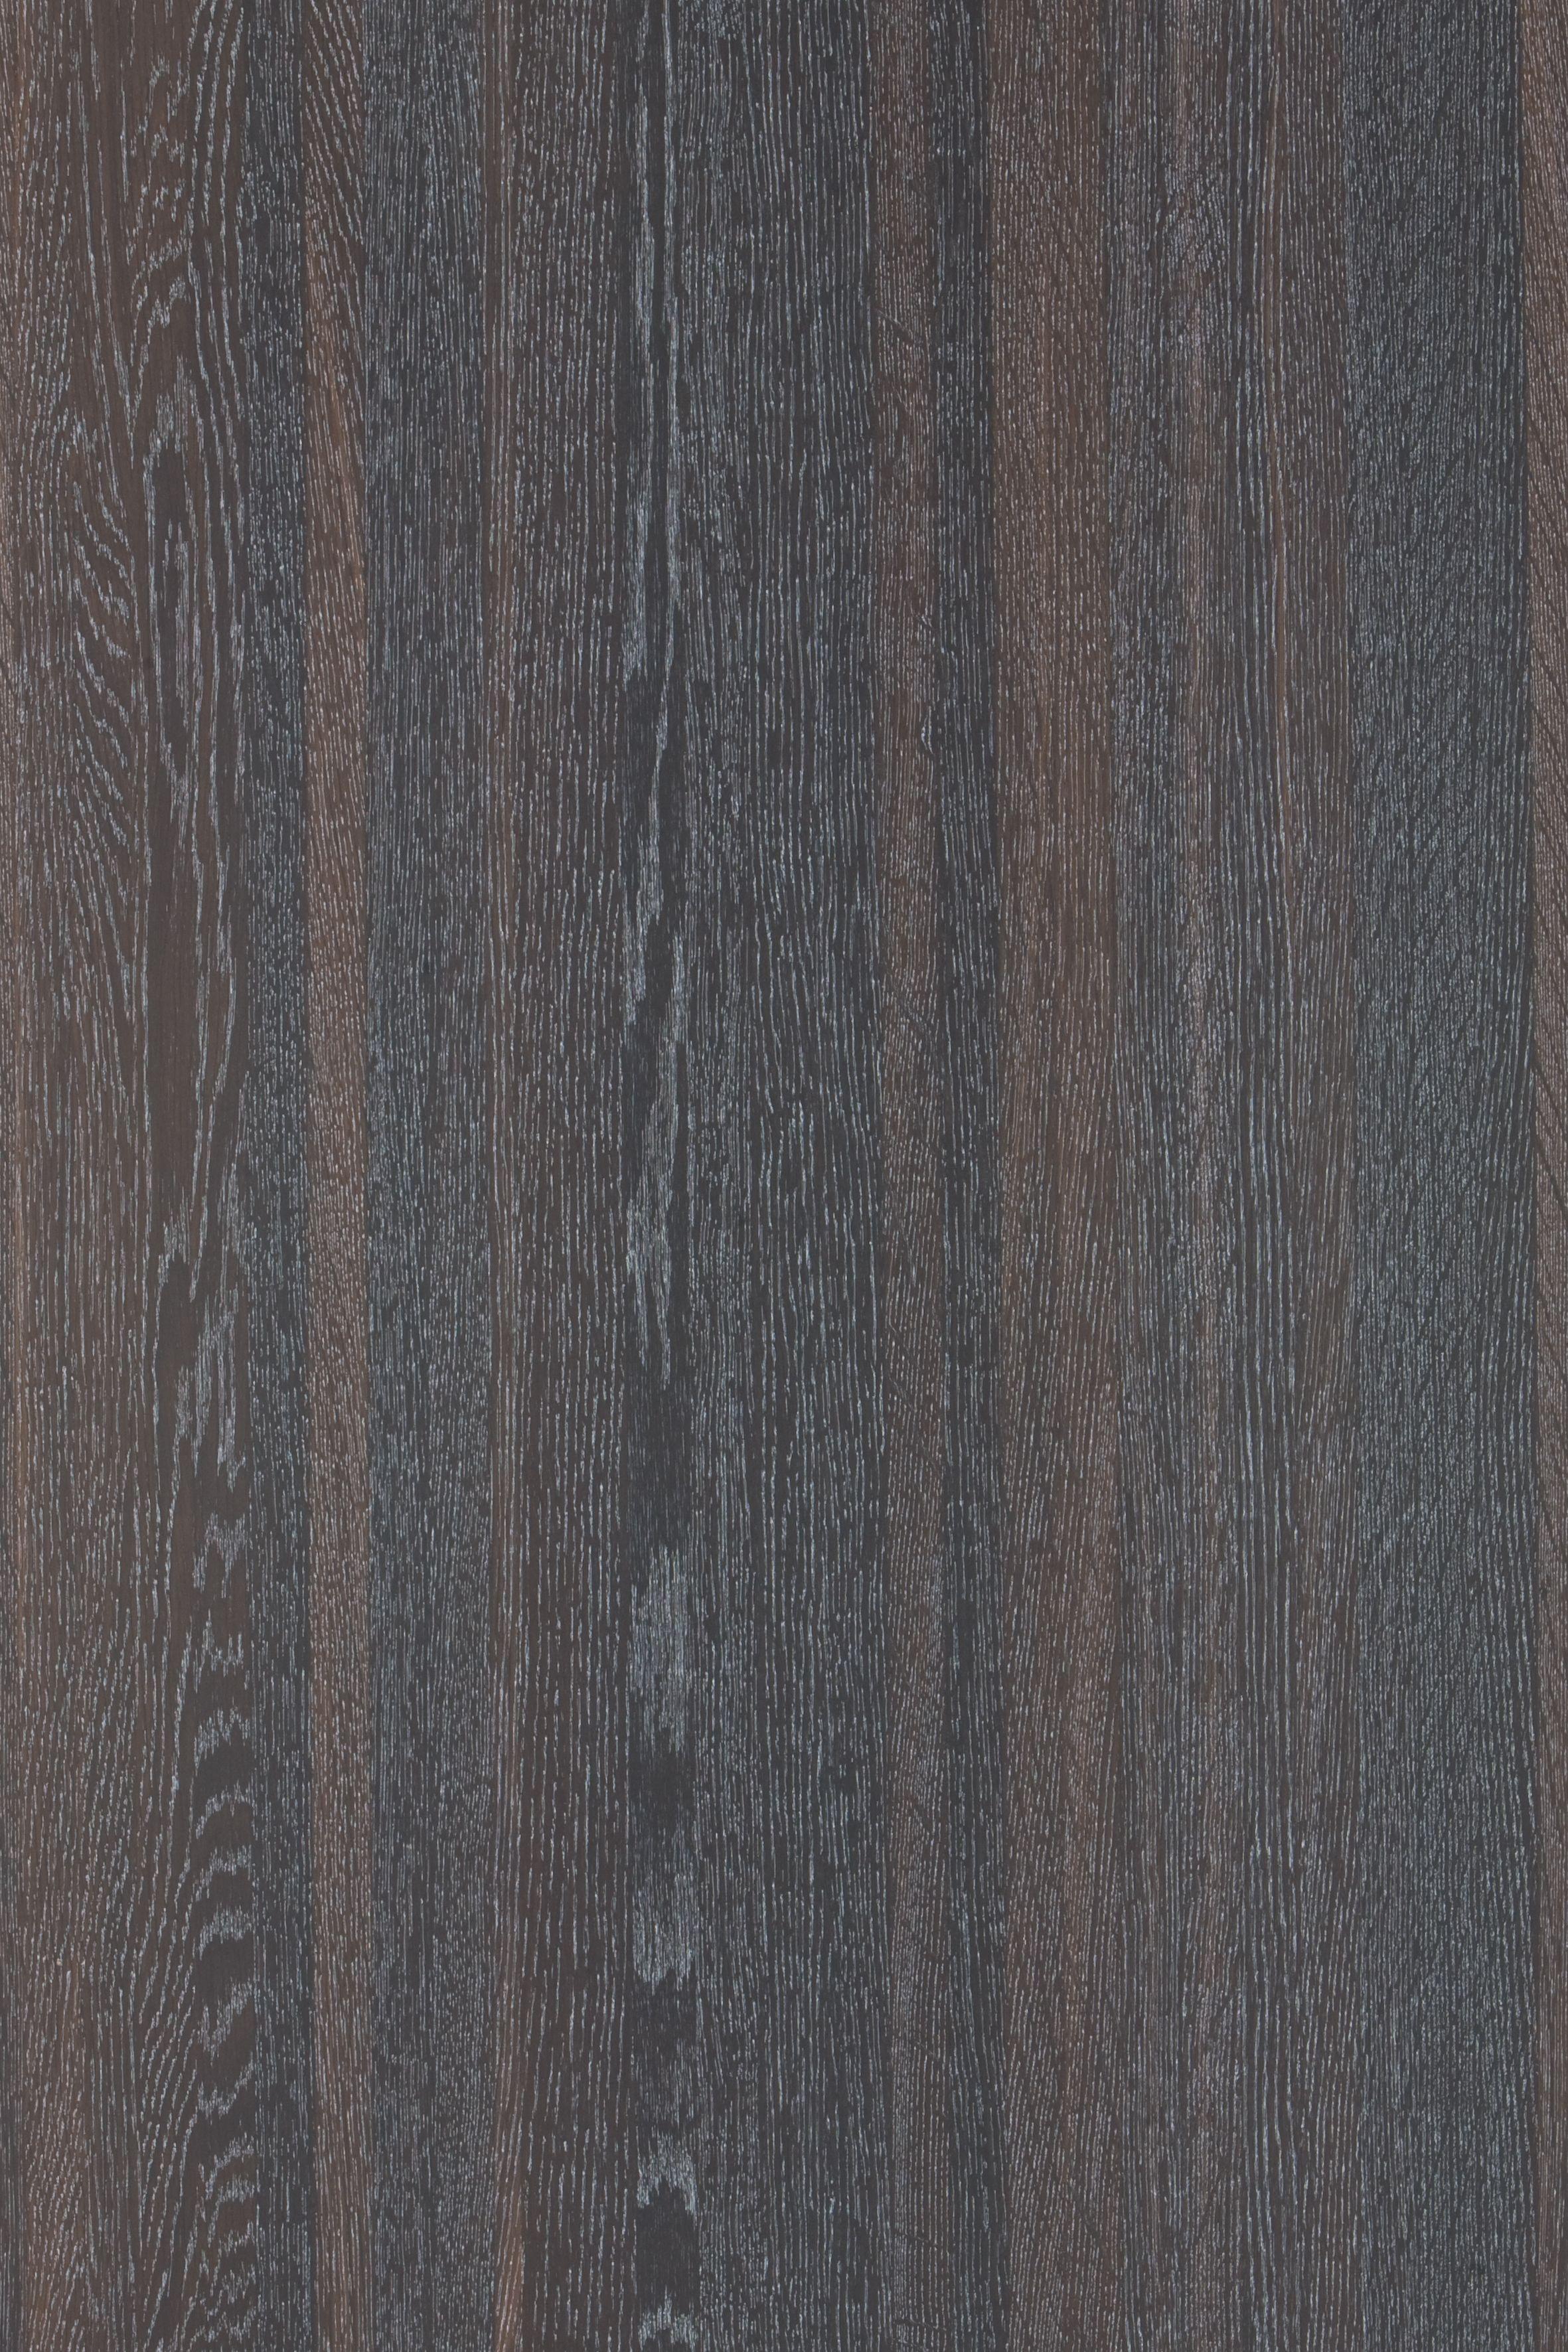 V20 Smoked Oak Limed Textured Matte finish